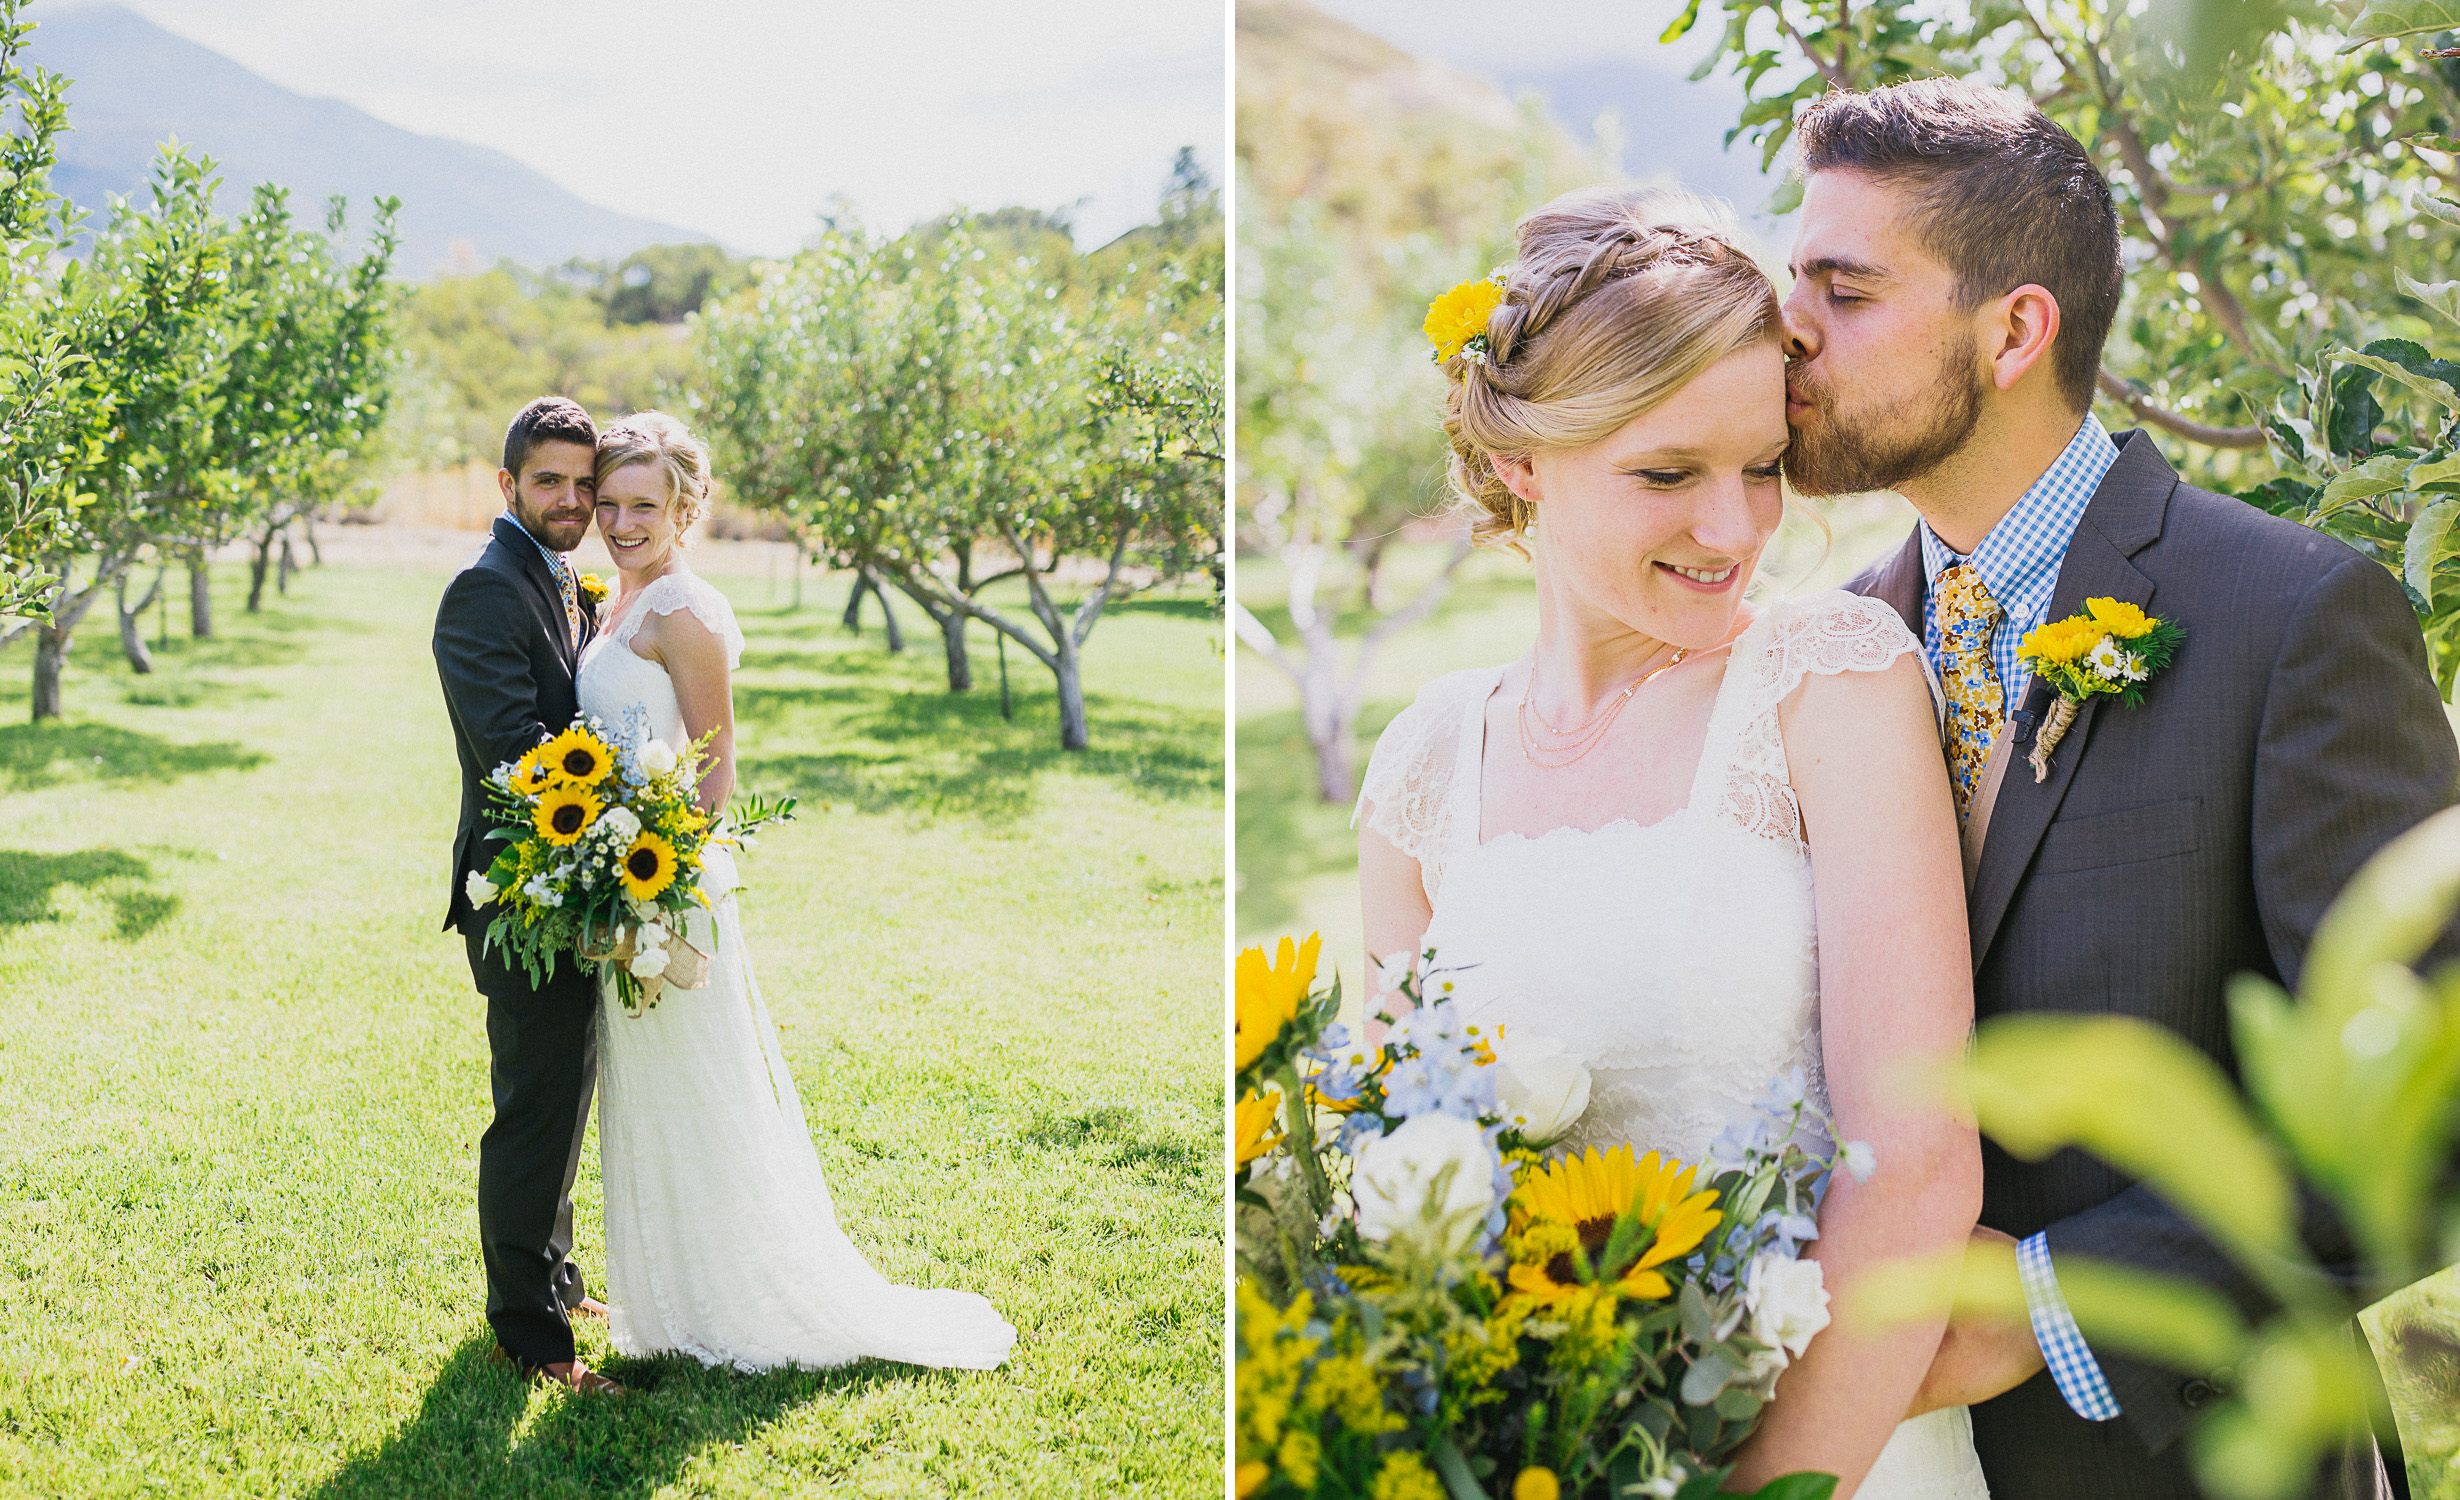 Salt-Lake-City-Wedding-Photographer-Utah-08.jpg